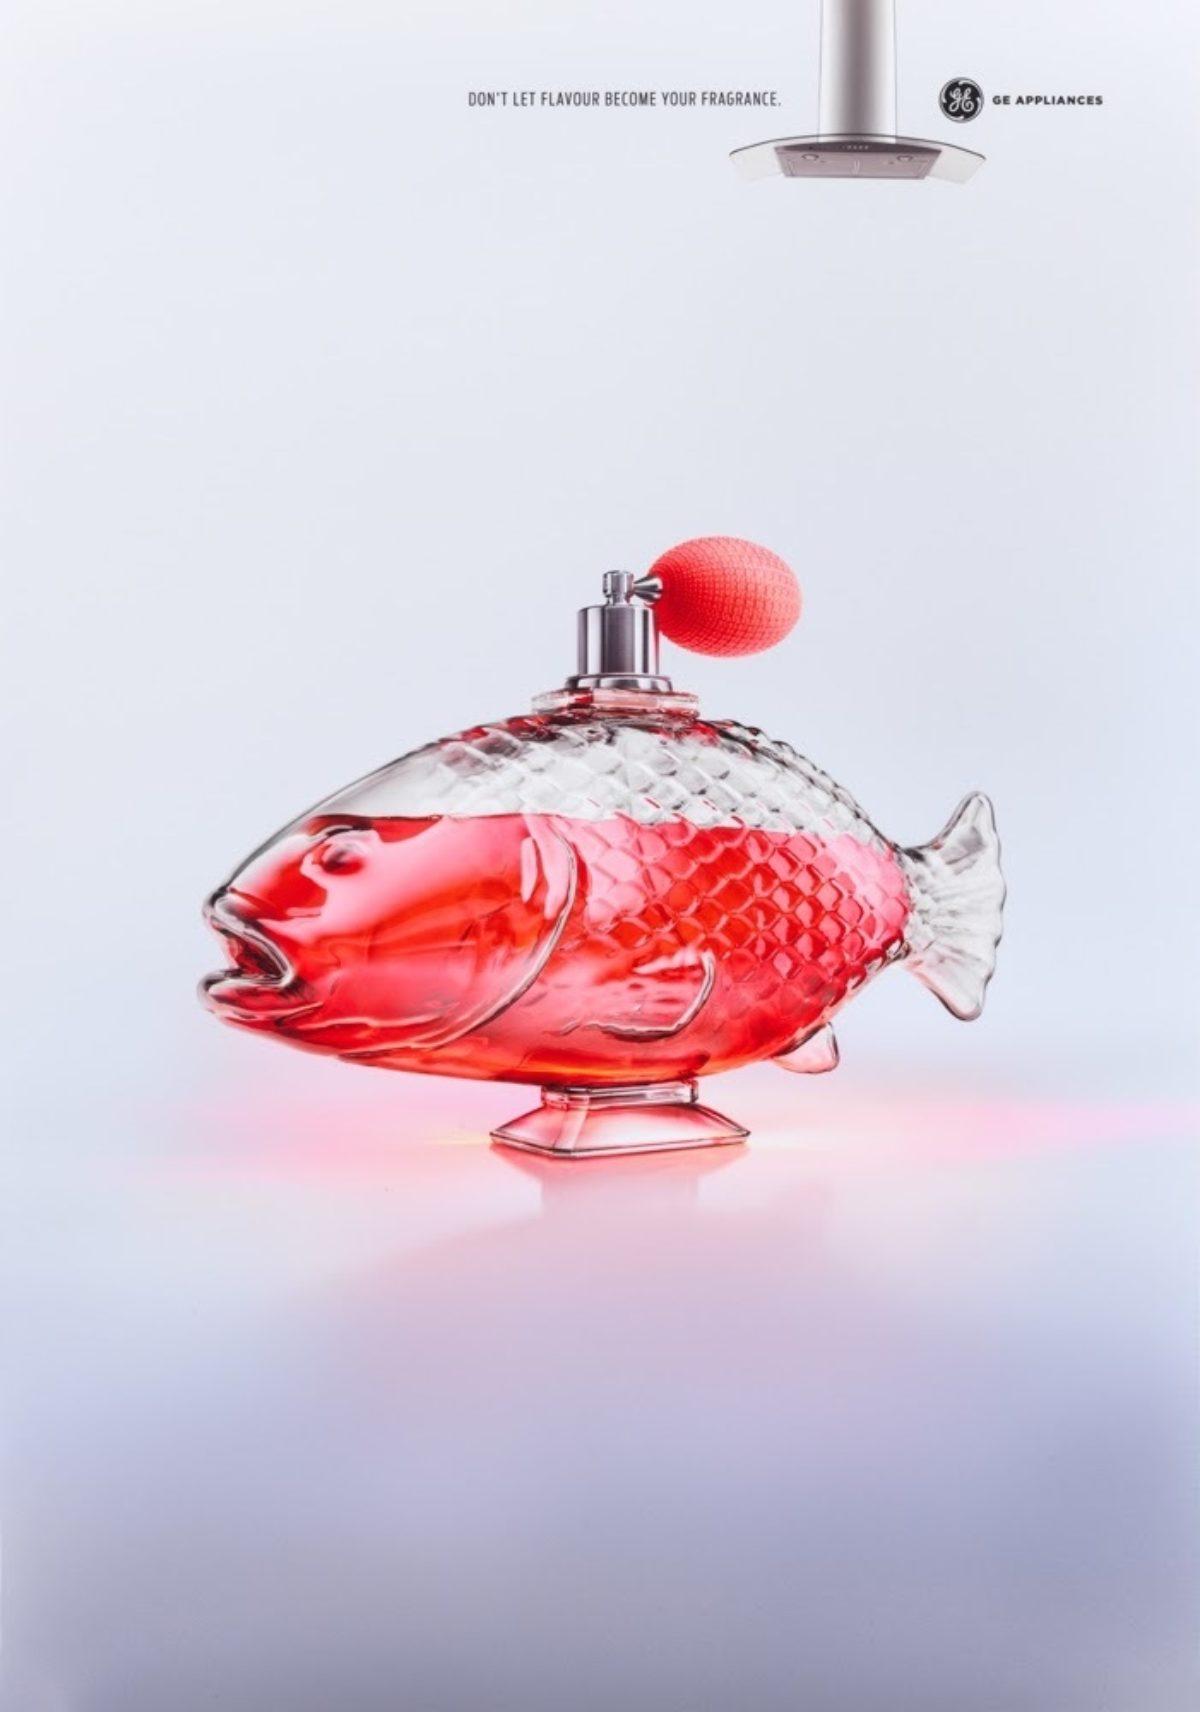 fish-odor